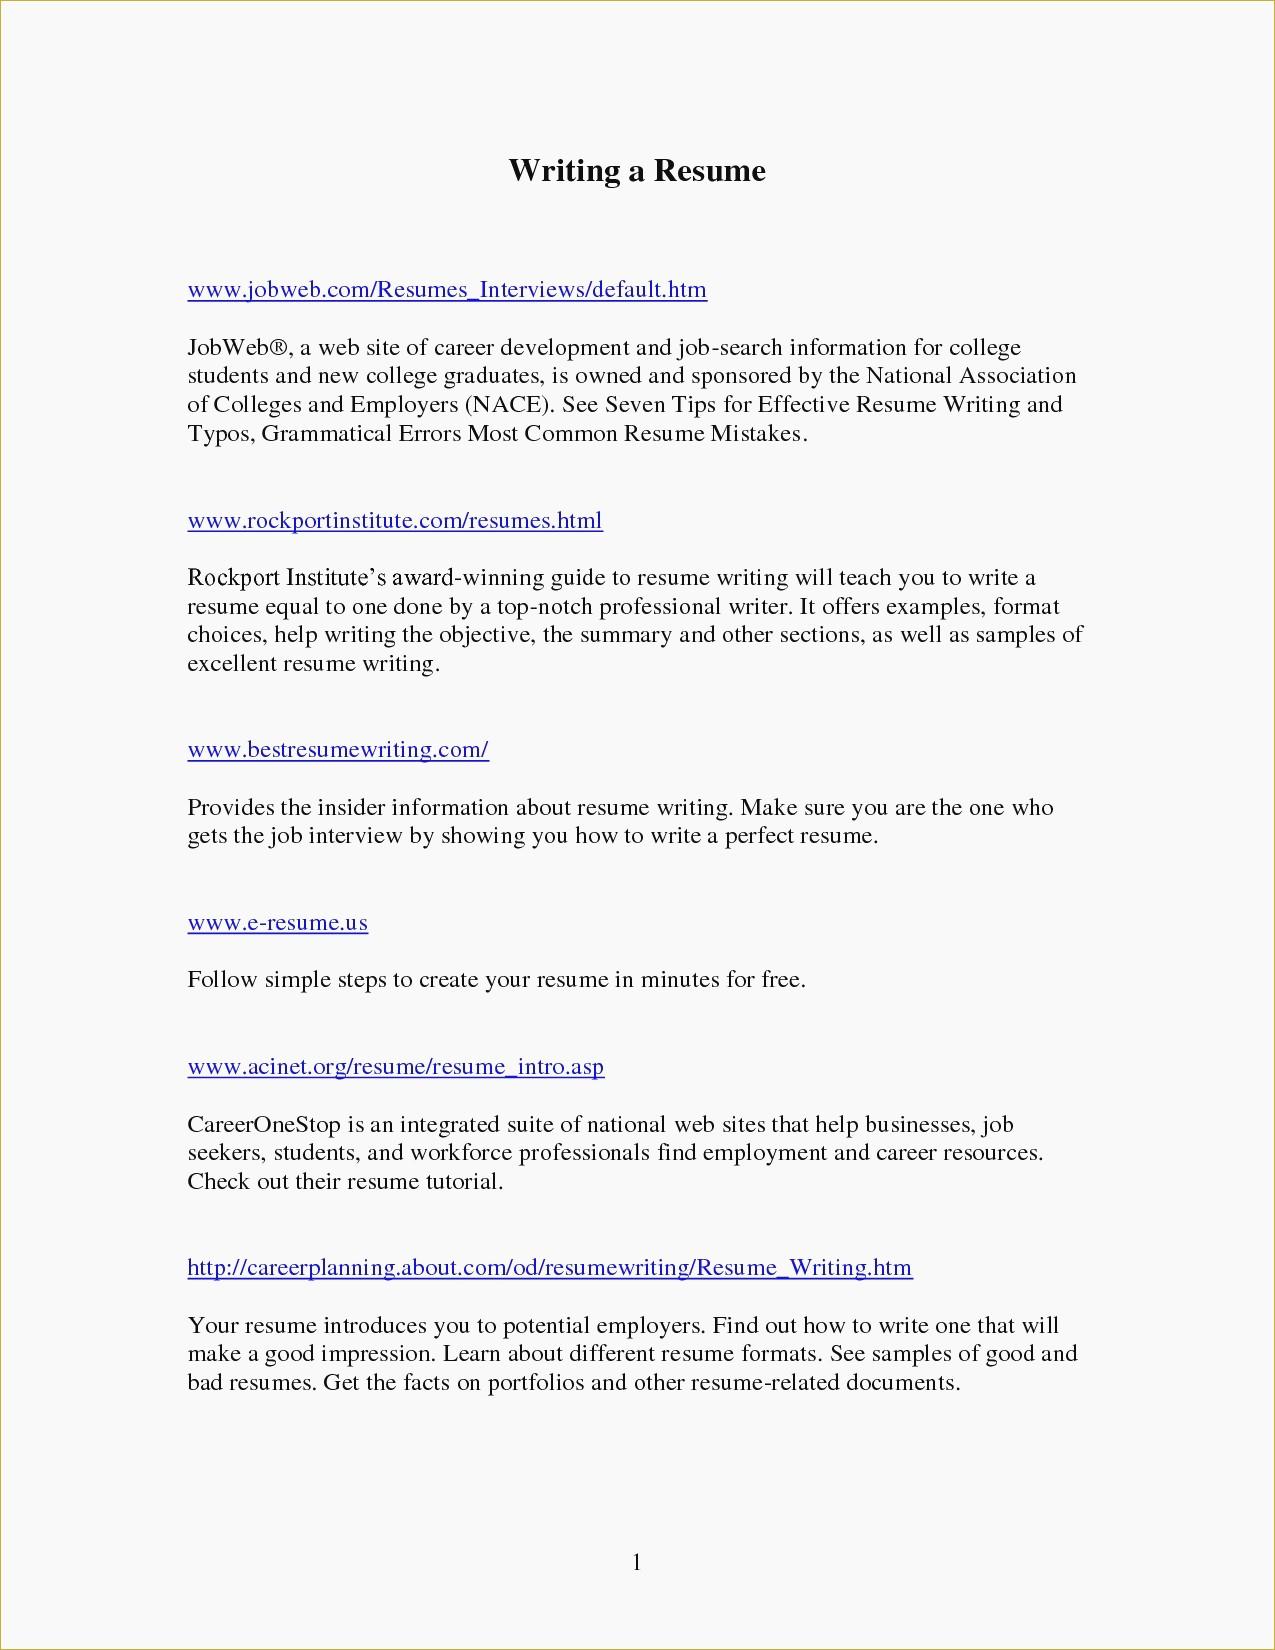 simple job offer letter template Collection-Simple Job fer Letter Sample New Job Fer Letter Template Us Fresh Resume Letter format Download 14-j